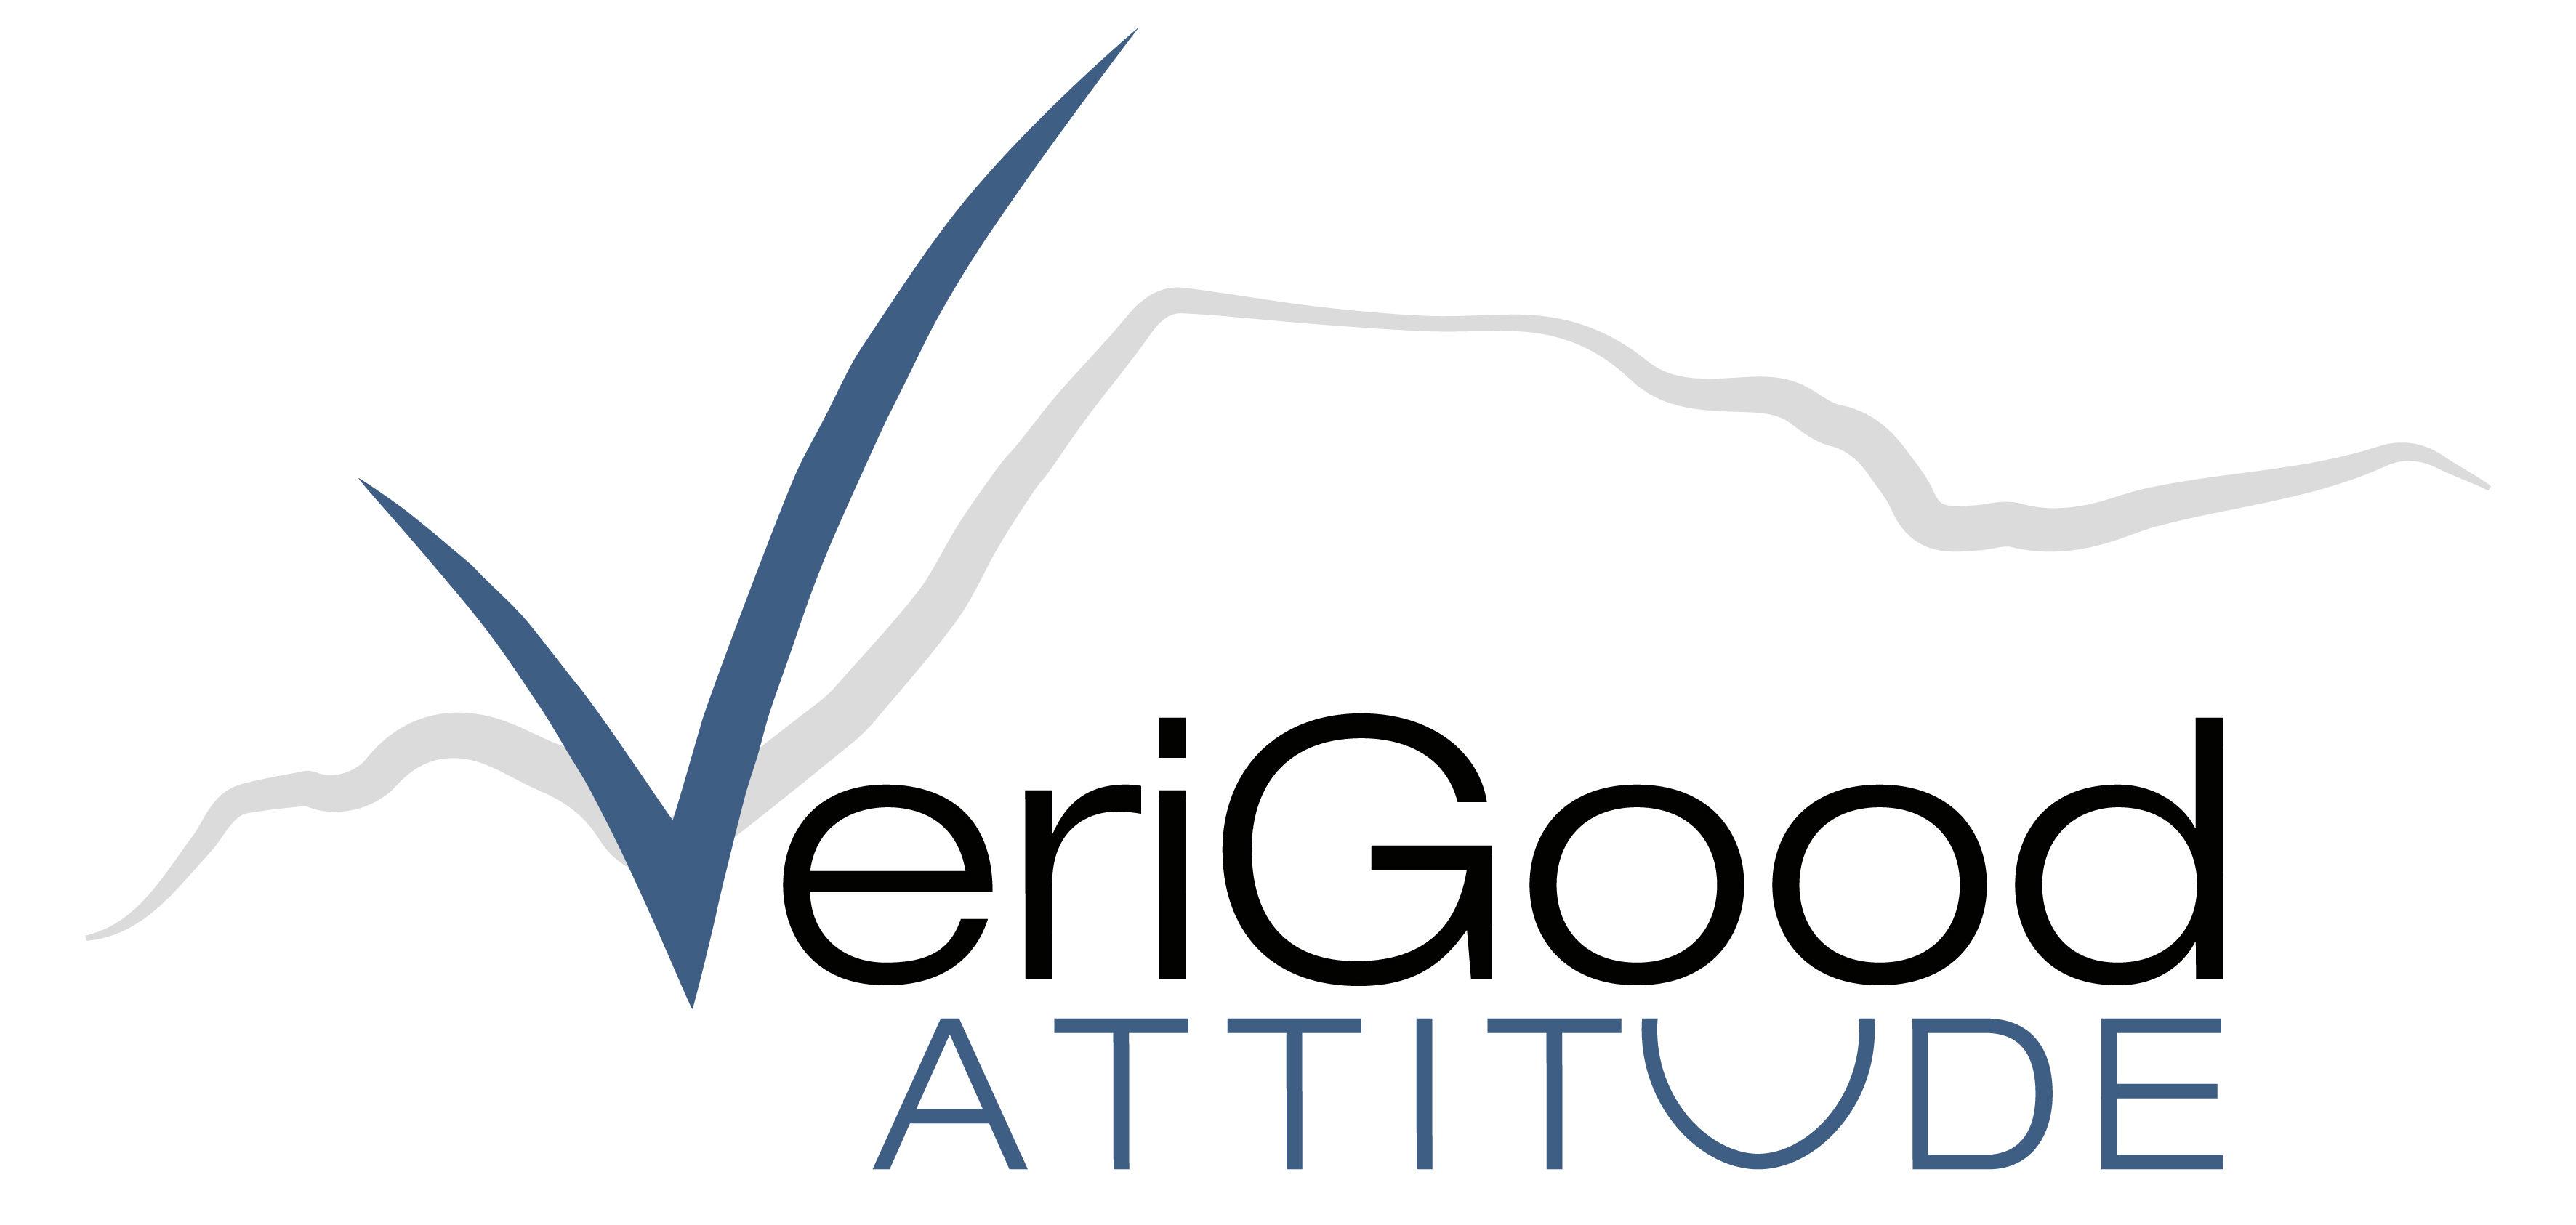 VeriGood Attitude